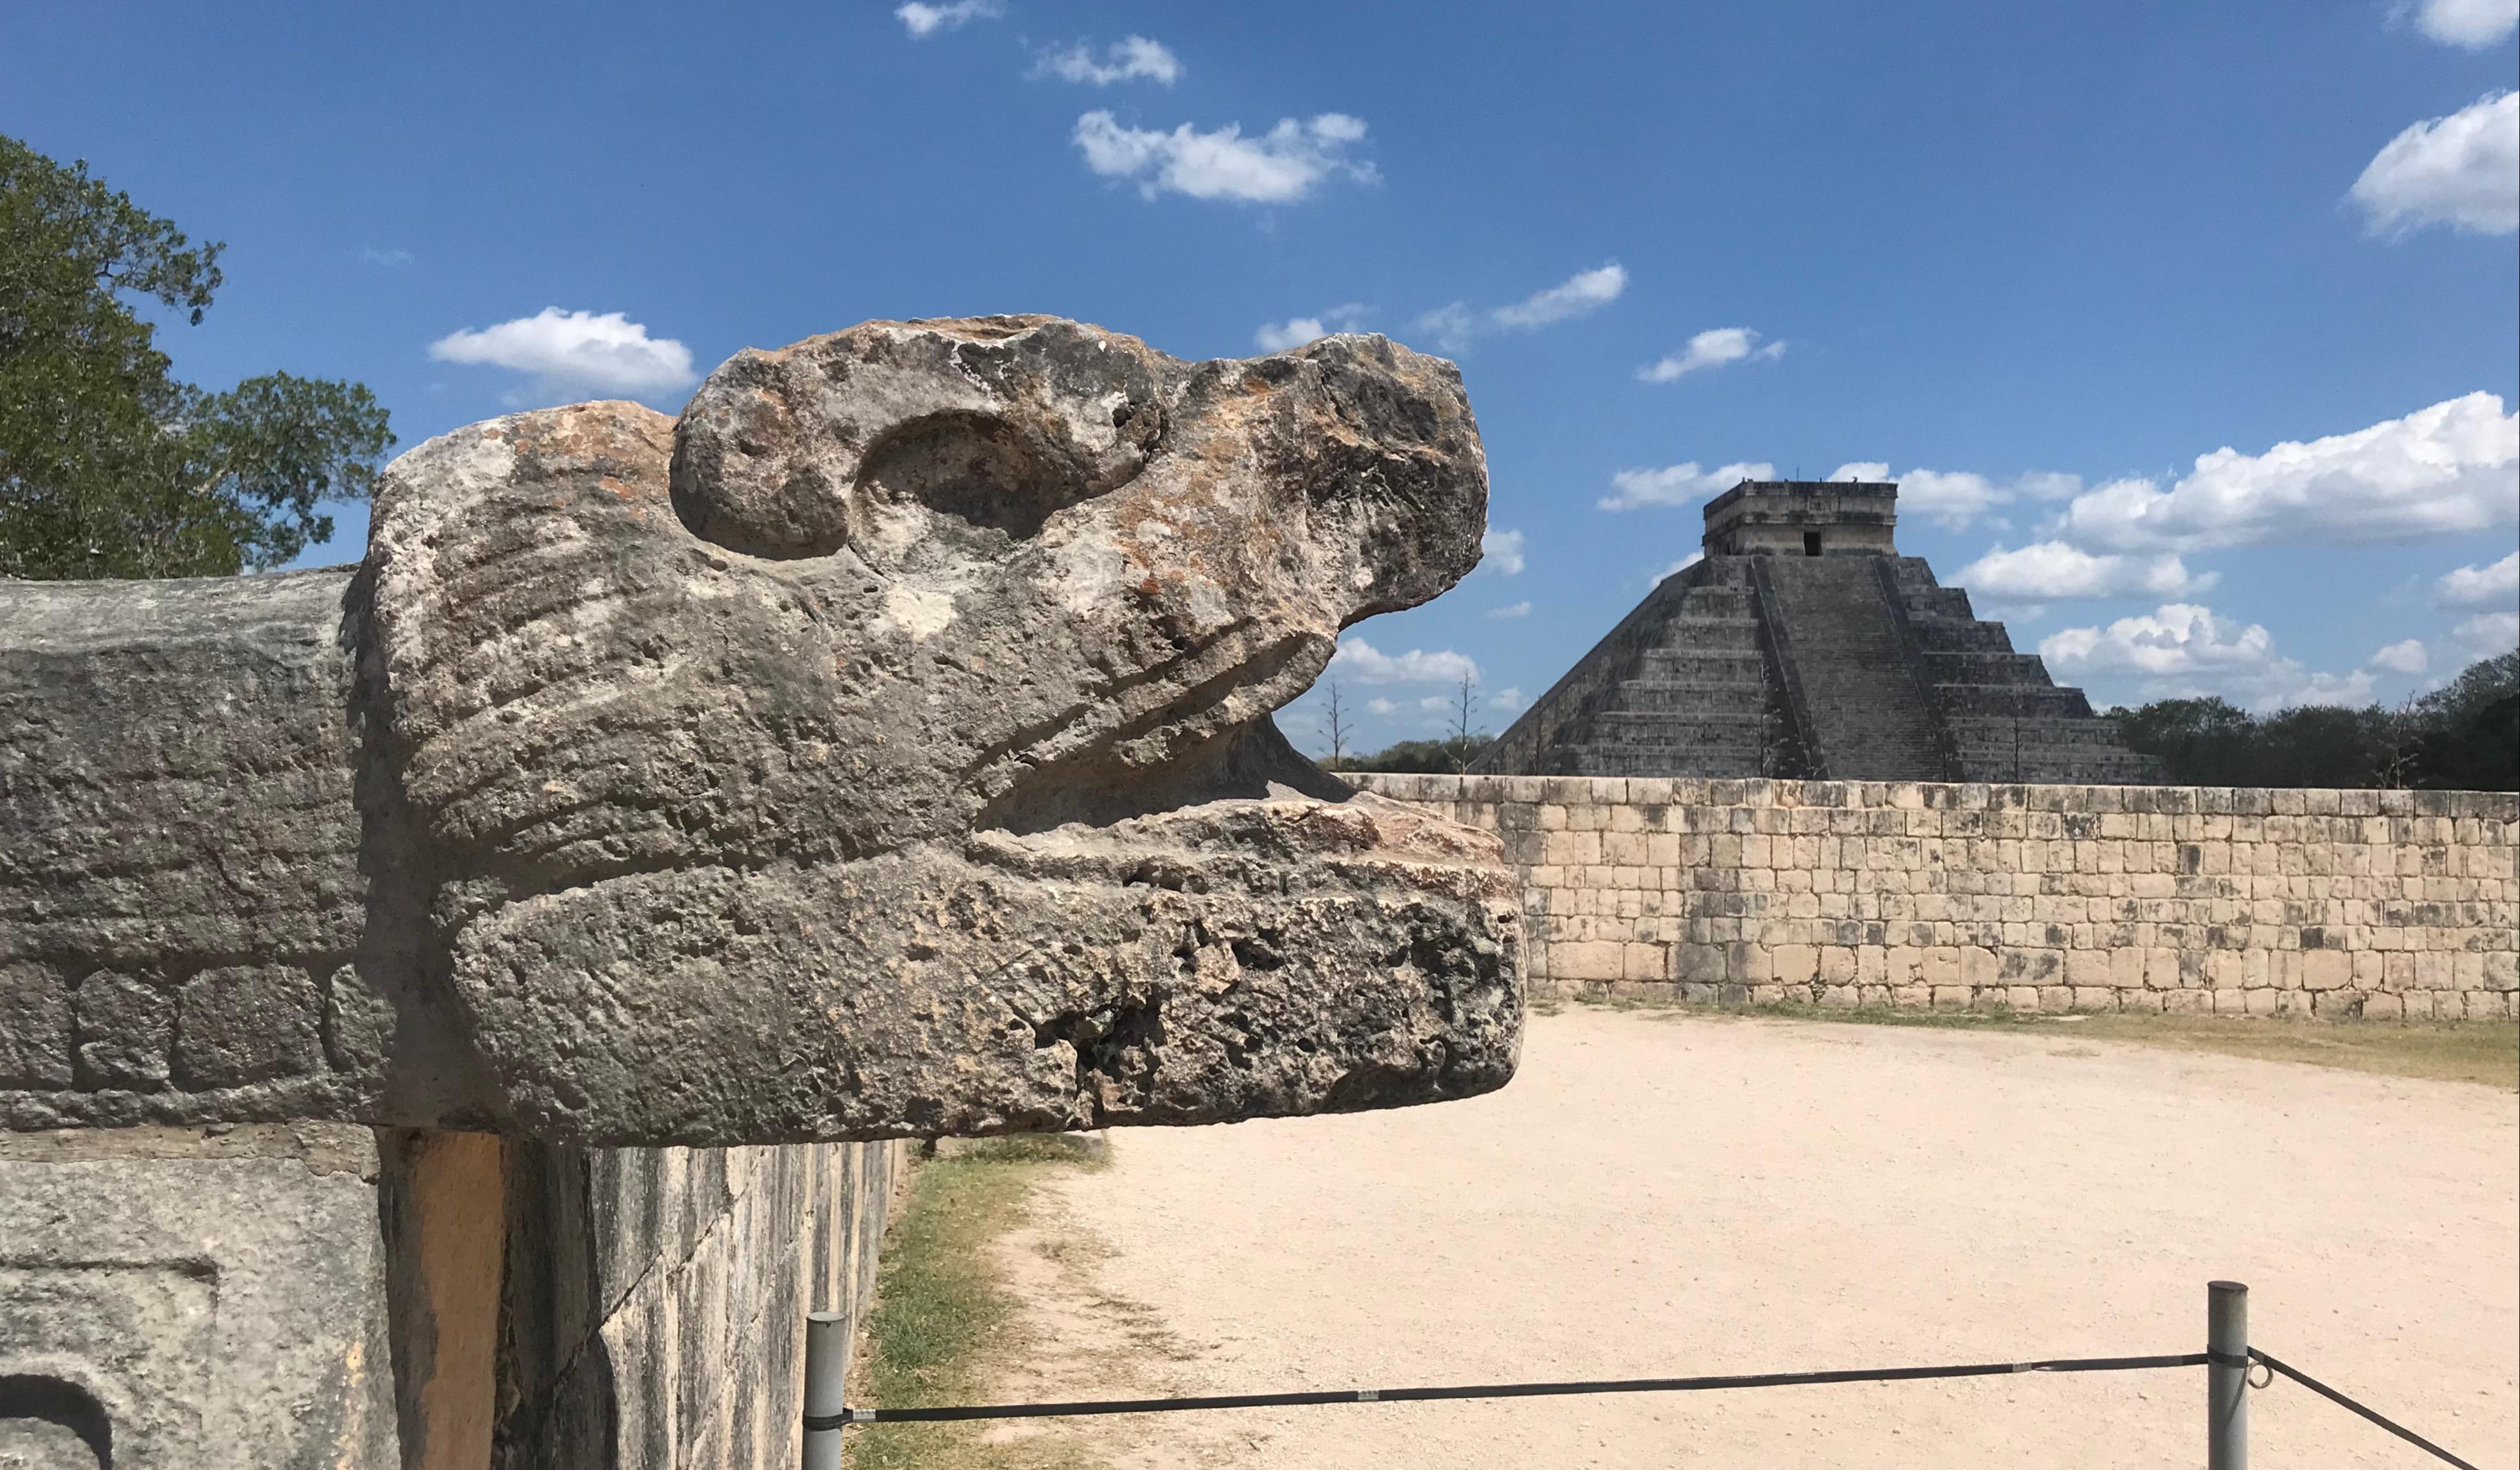 Que faire au Mexique ? - Chichén Itzá © Clara Casciana